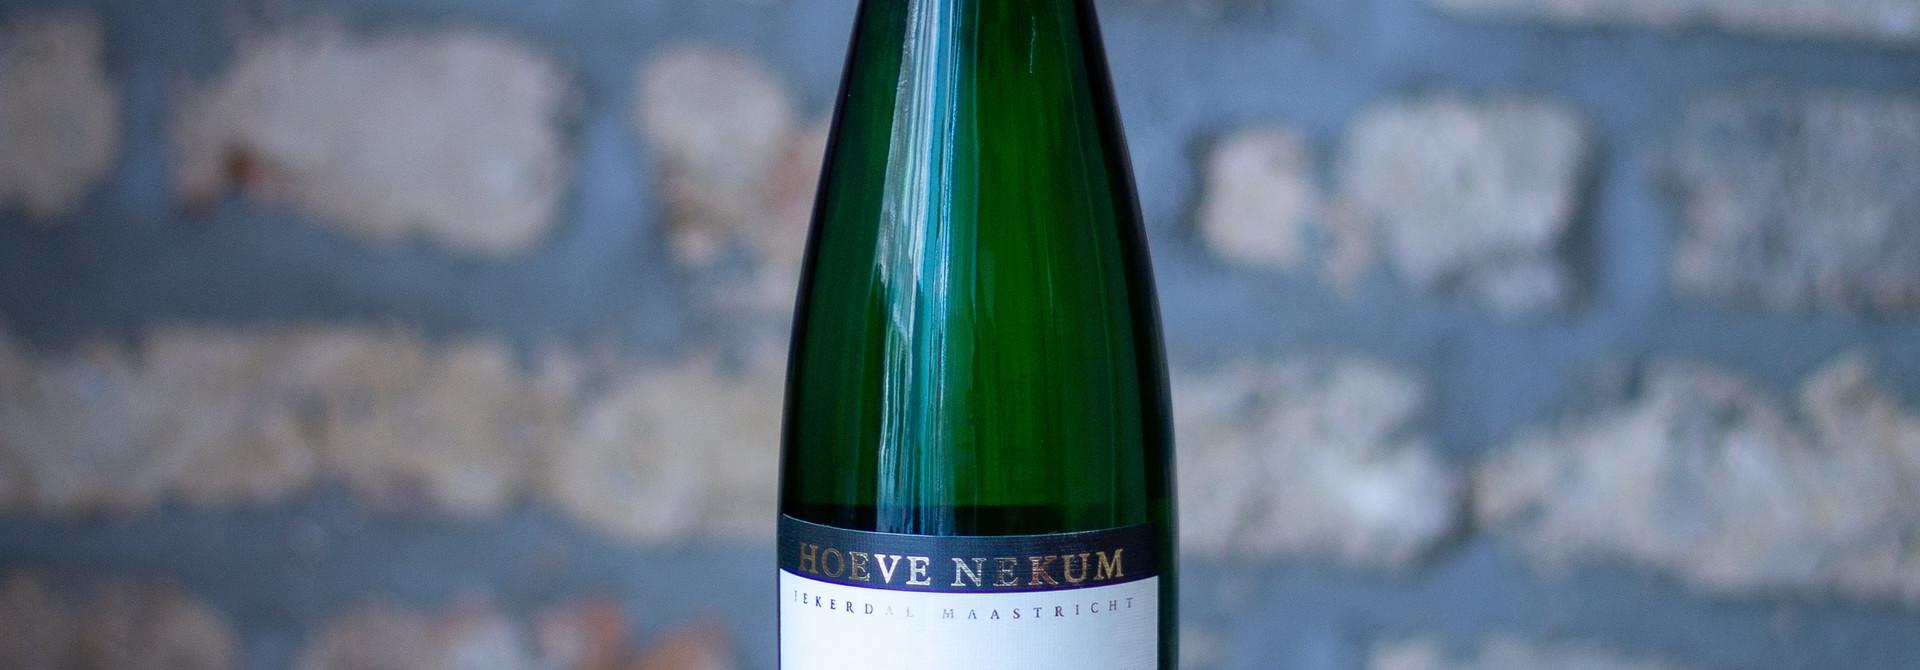 Hoeve Nekum Cuvée